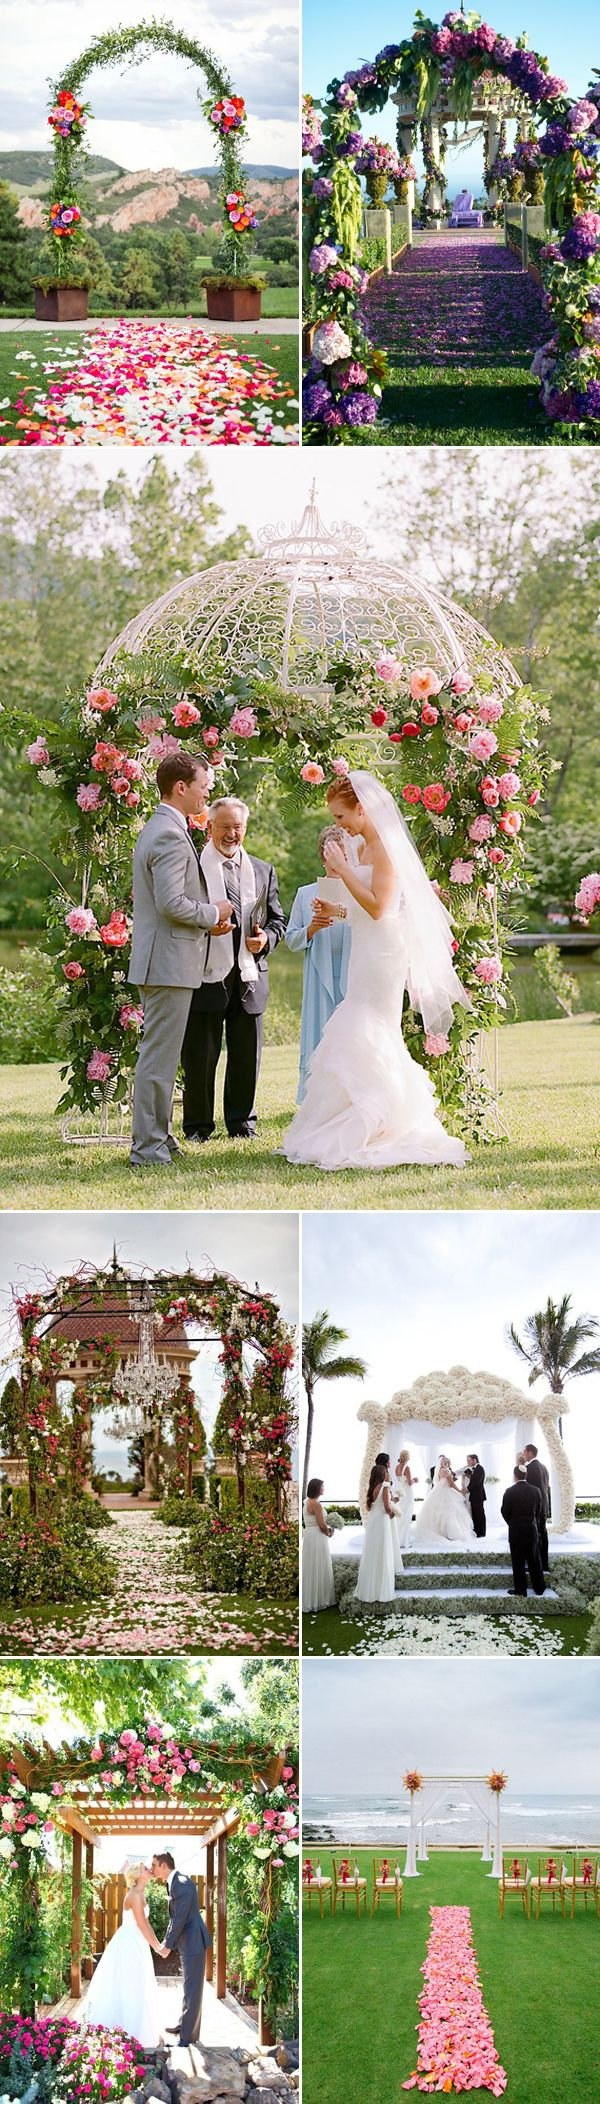 25 Hottest Summer Wedding Altar Ideas   http://www.deerpearlflowers.com/25-hottest-summer-wedding-altar-ideas/